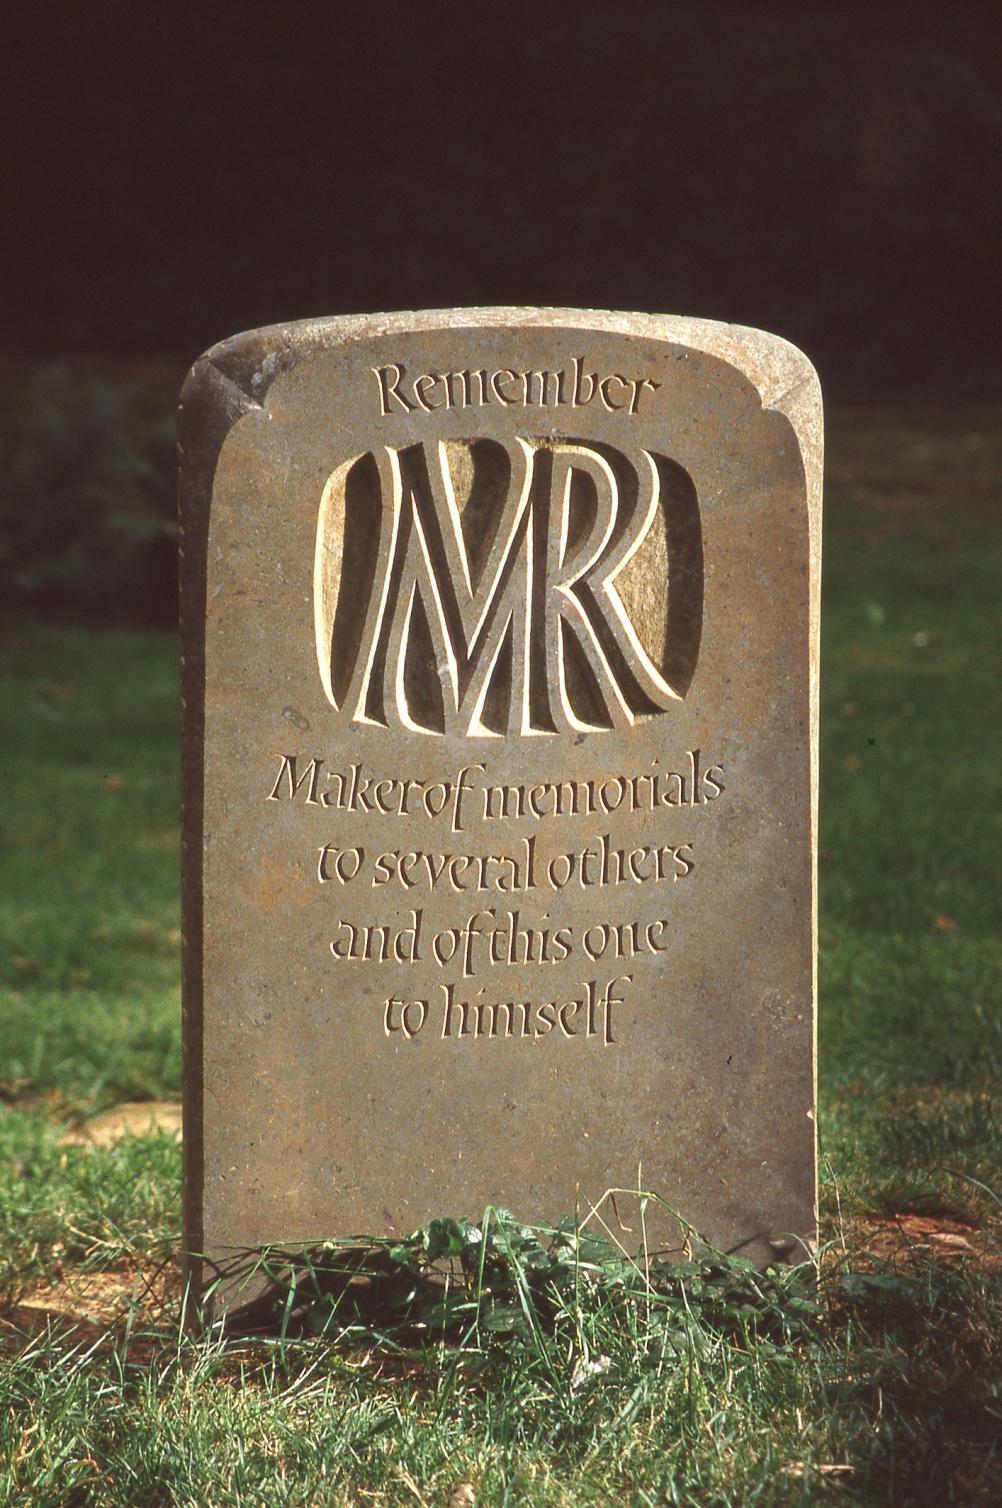 Michael Renton's memorial stone (front)